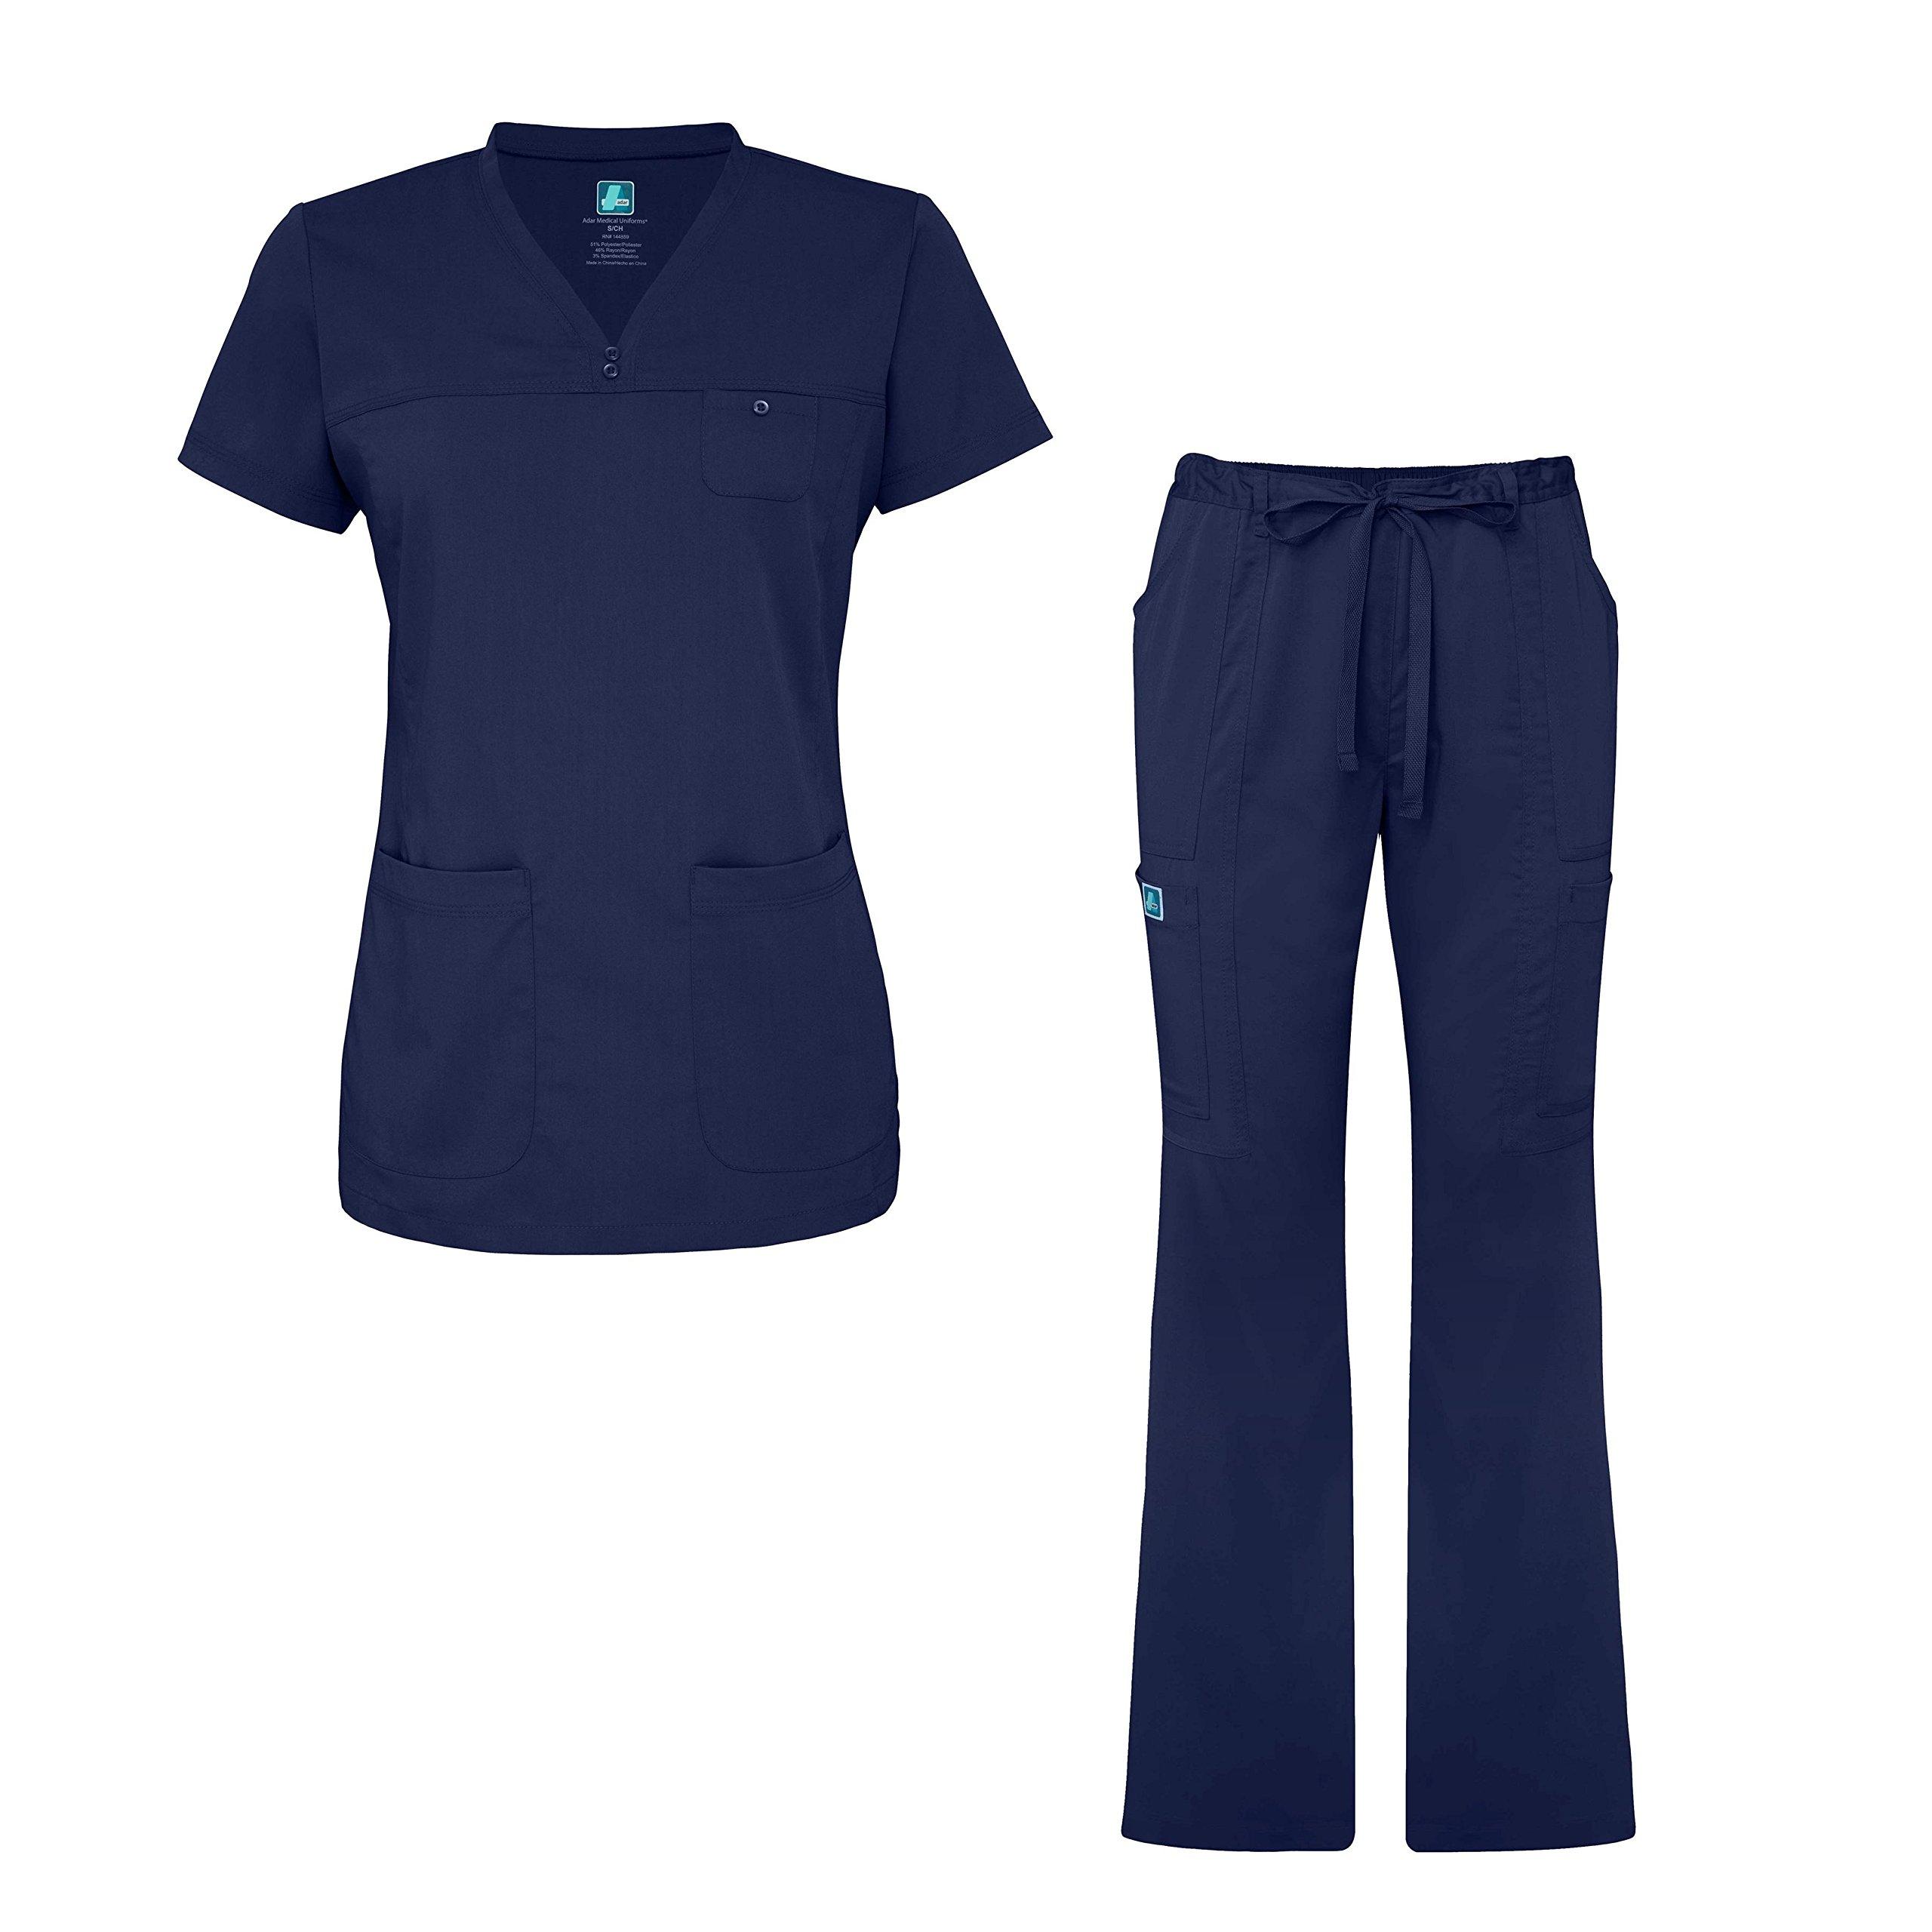 Adar Indulgence Jr. Fit Womens Scrub Set Curved V-Neck Medical Scrub Top and Scrub Pants - 4401 - Navy - S